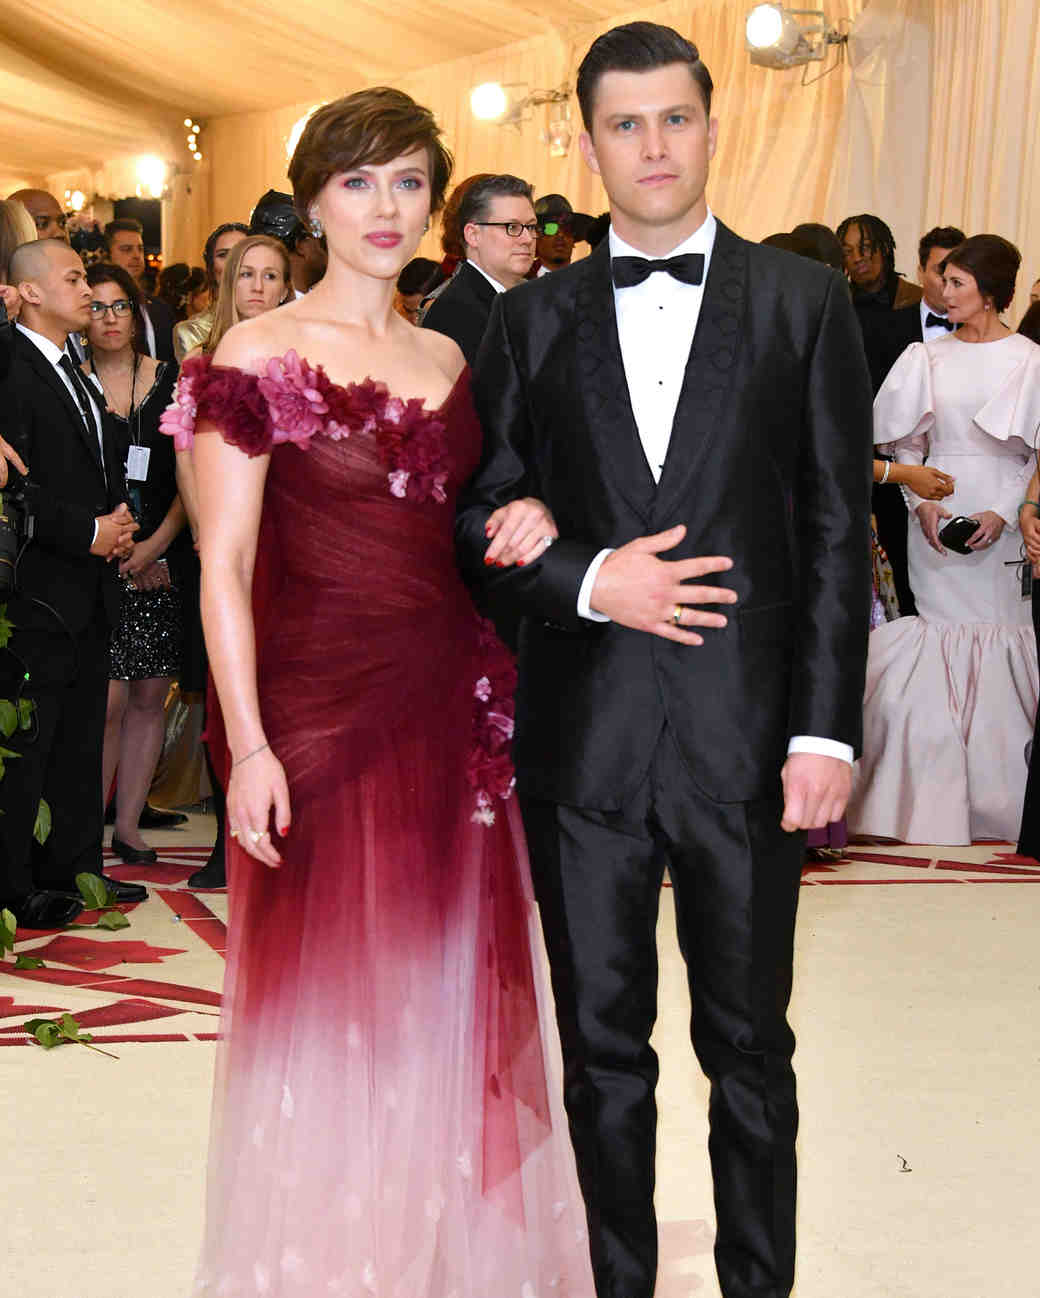 Scarlett Johansson and Colin Jost 2018 Met Gala